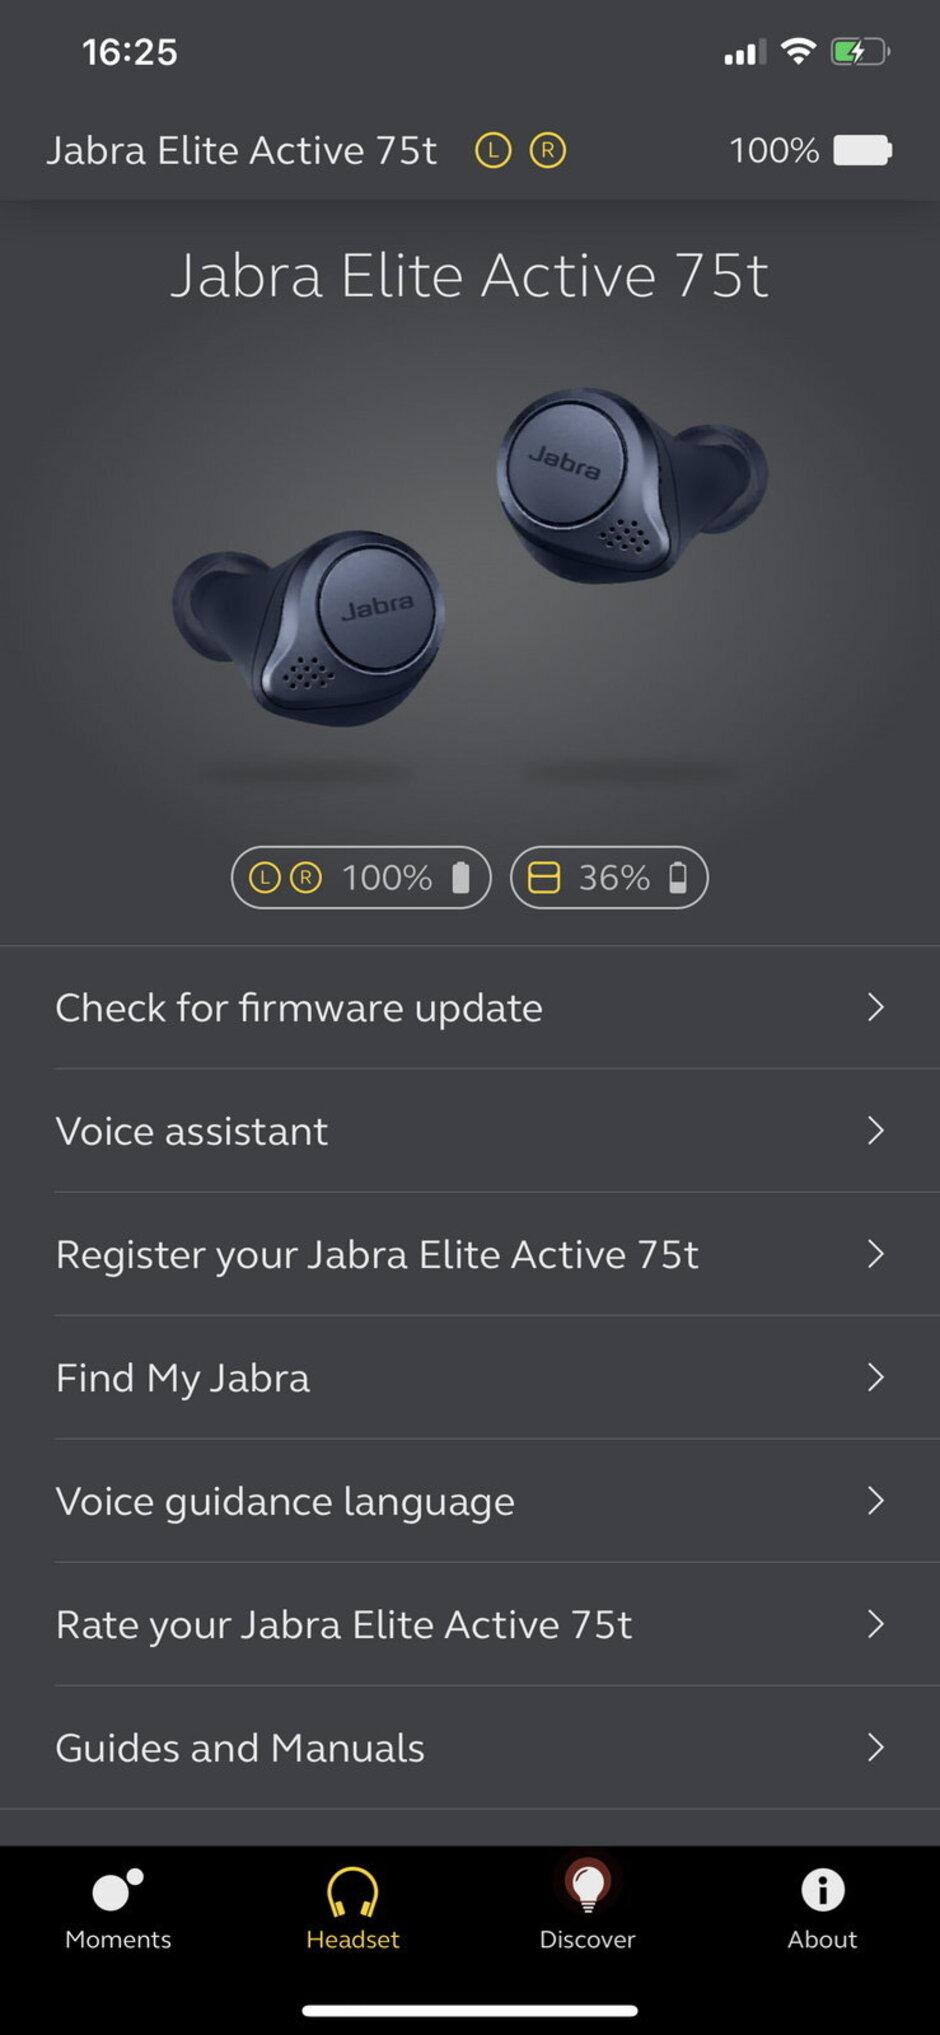 تطبيق Jabra Sound + - مراجعة Jabra Elite Active 75t